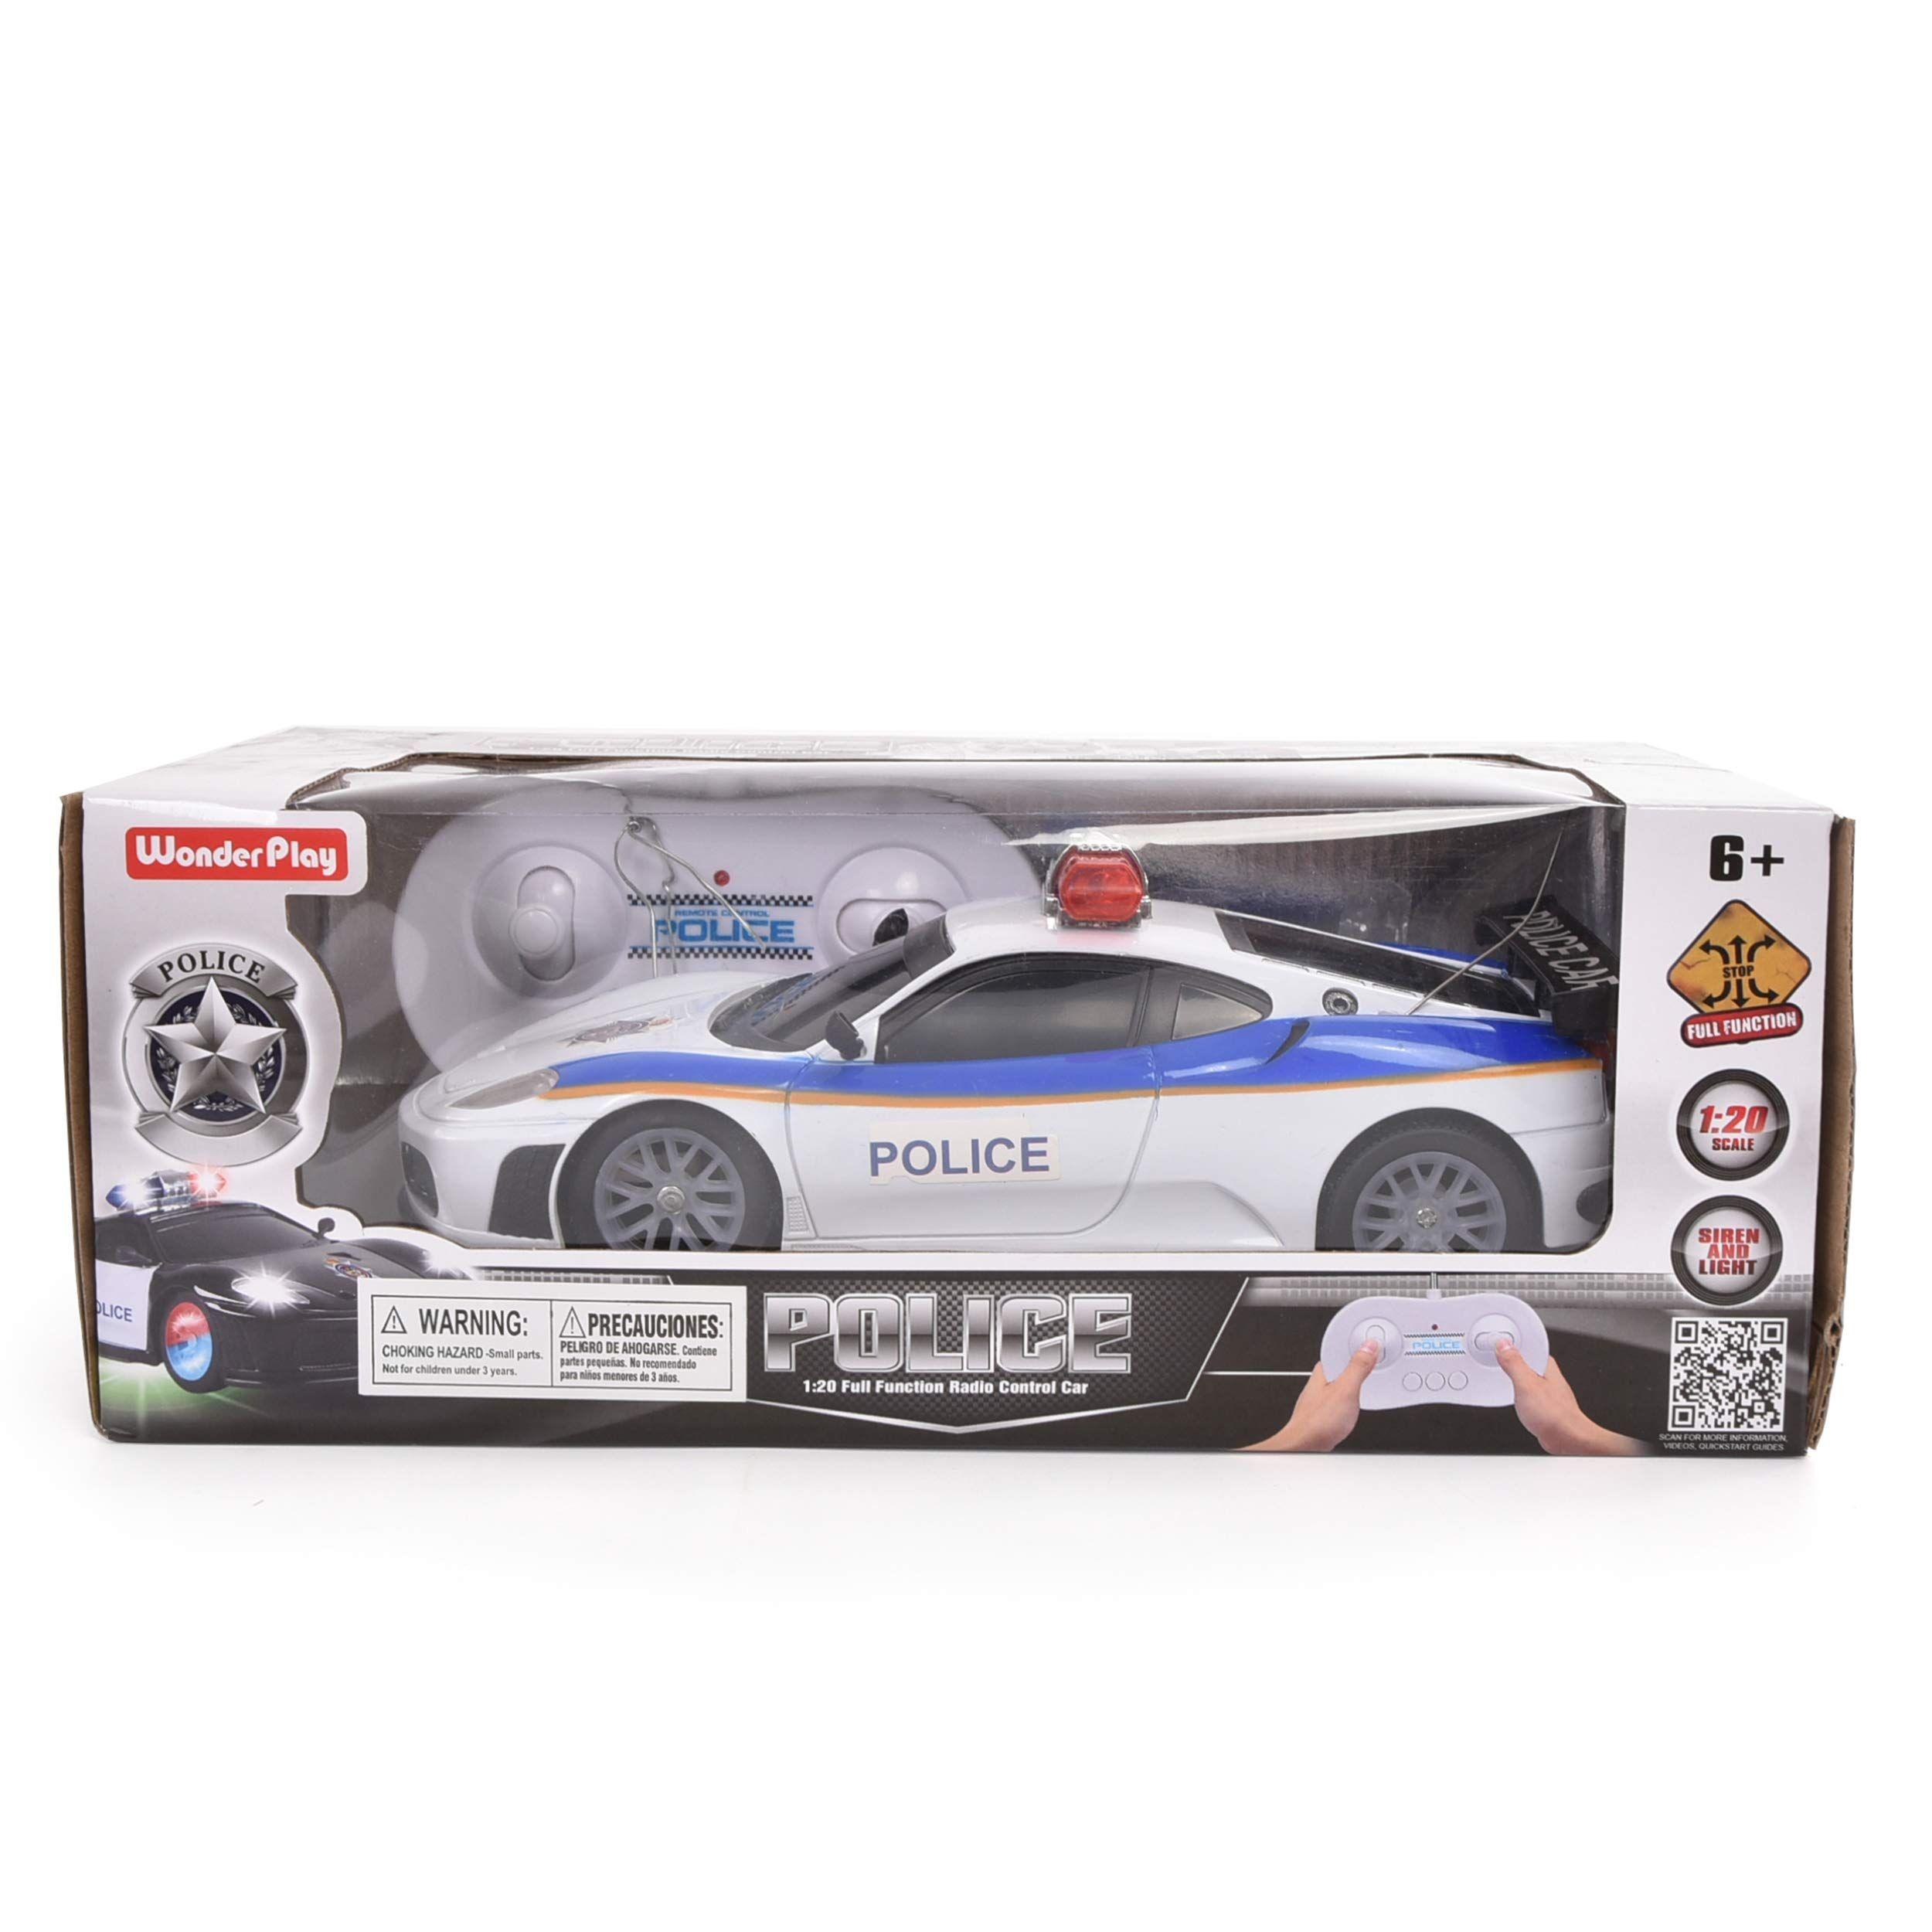 Wonder Play 1 20 Rc Police Car Remote Control Police Car